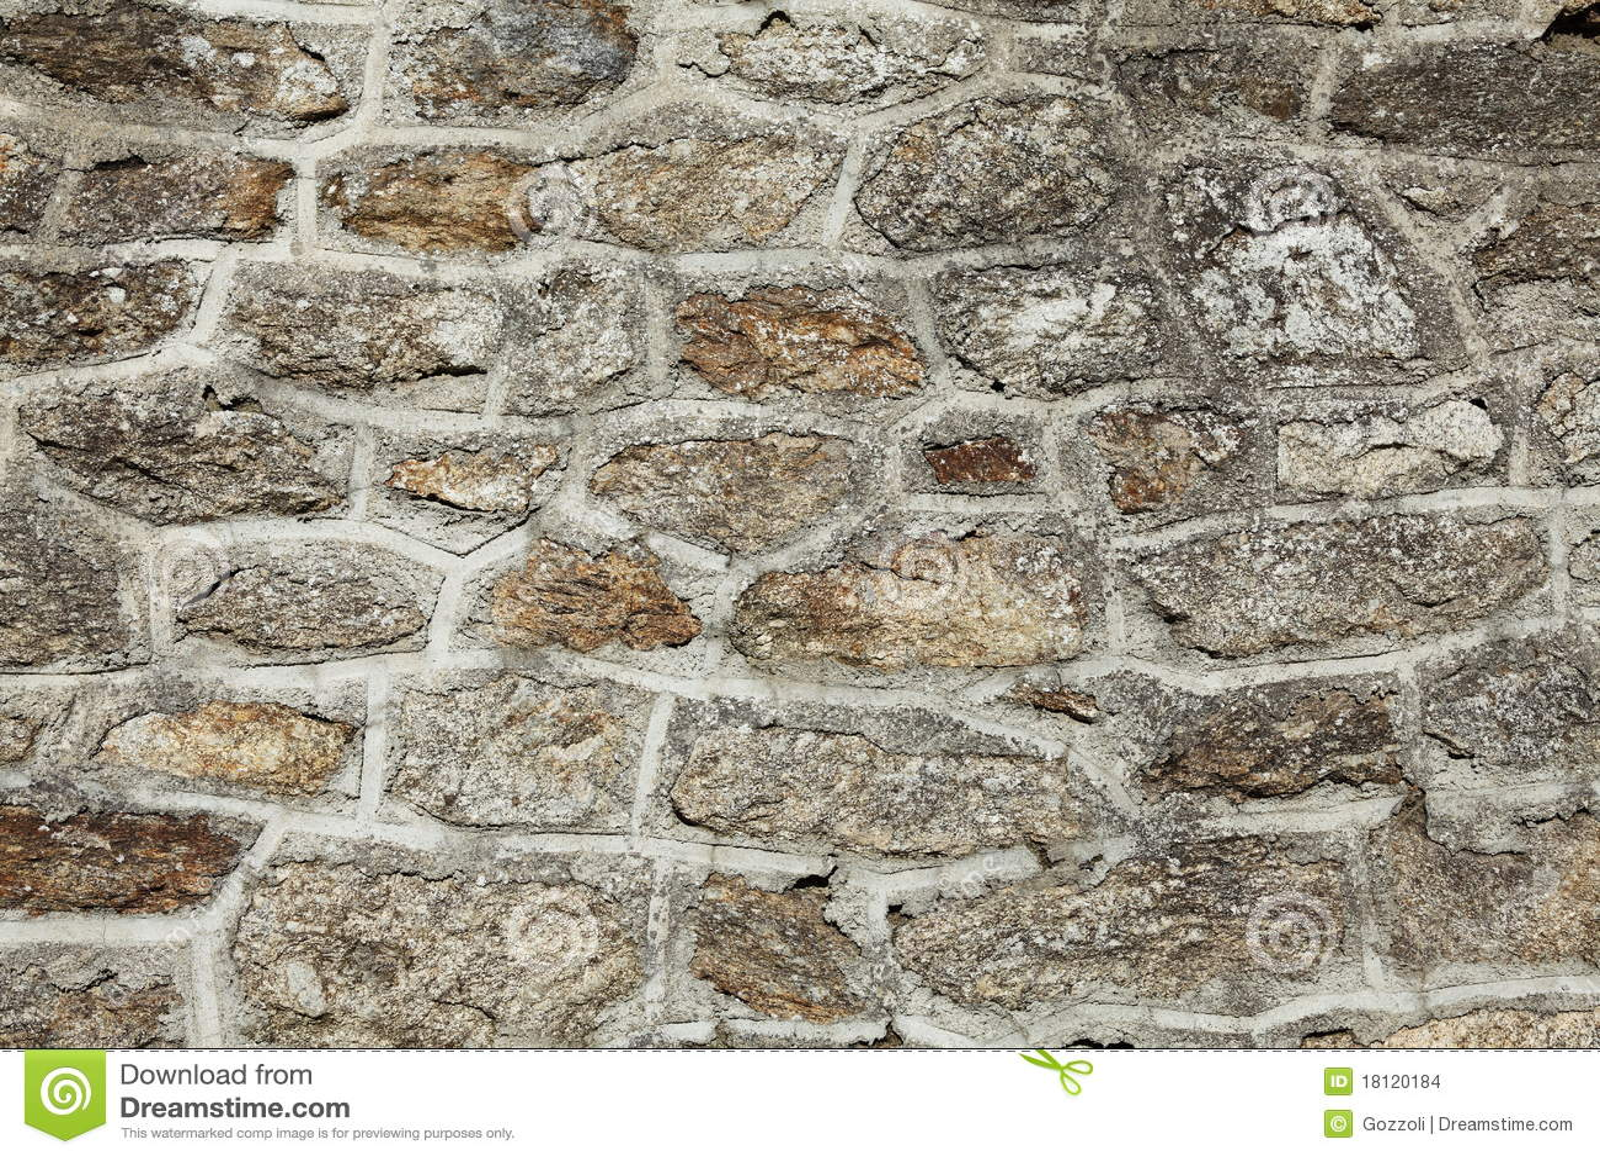 Granite Stone Texture : Background texture granite stone wall stock photo image